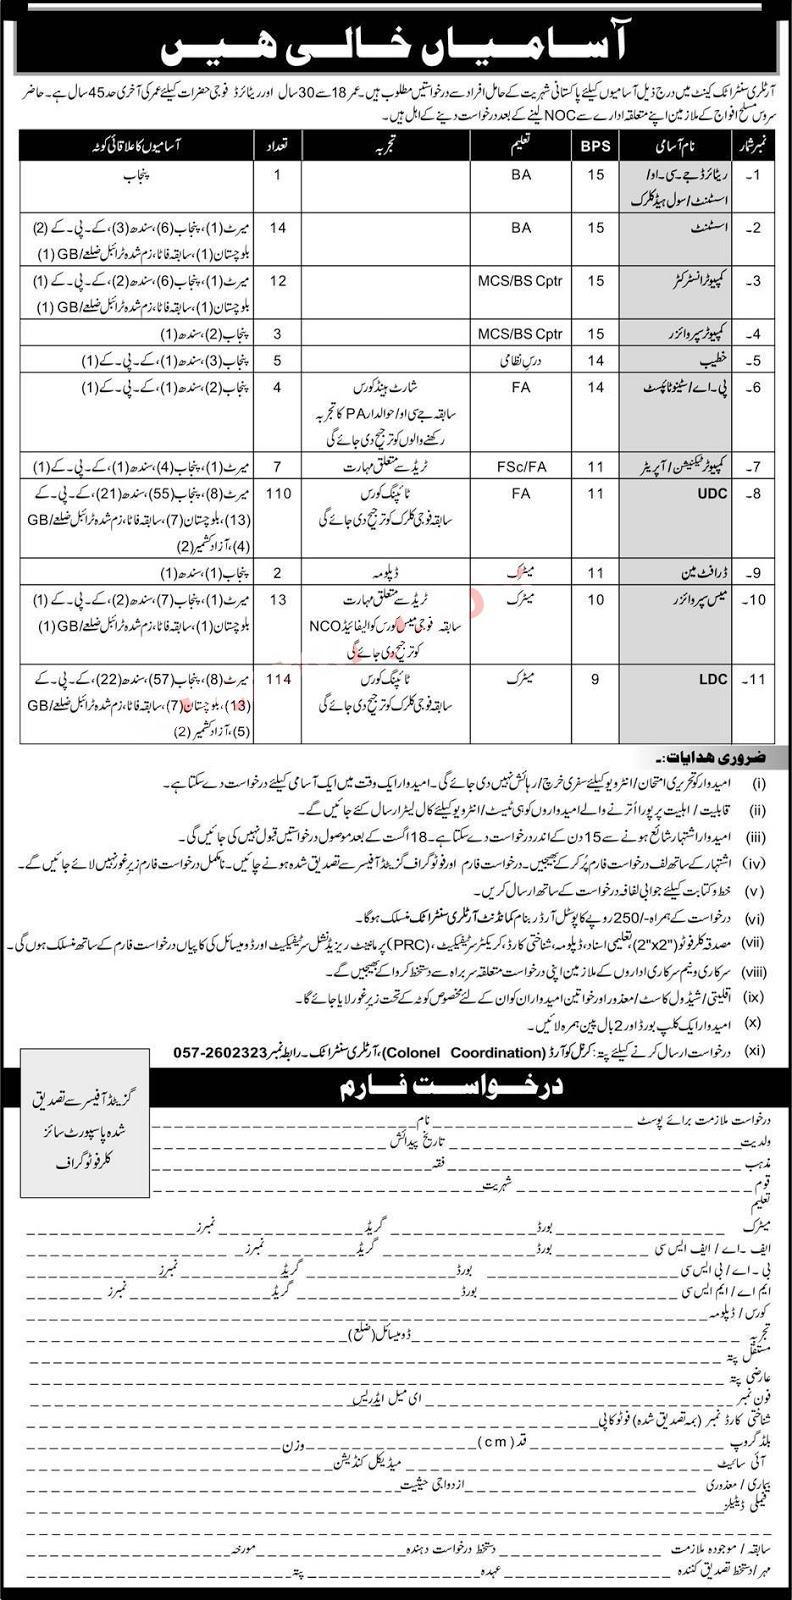 Pak Army Jobs 2019 for 285+ LDC/UDC Clerks, Assistants, IT